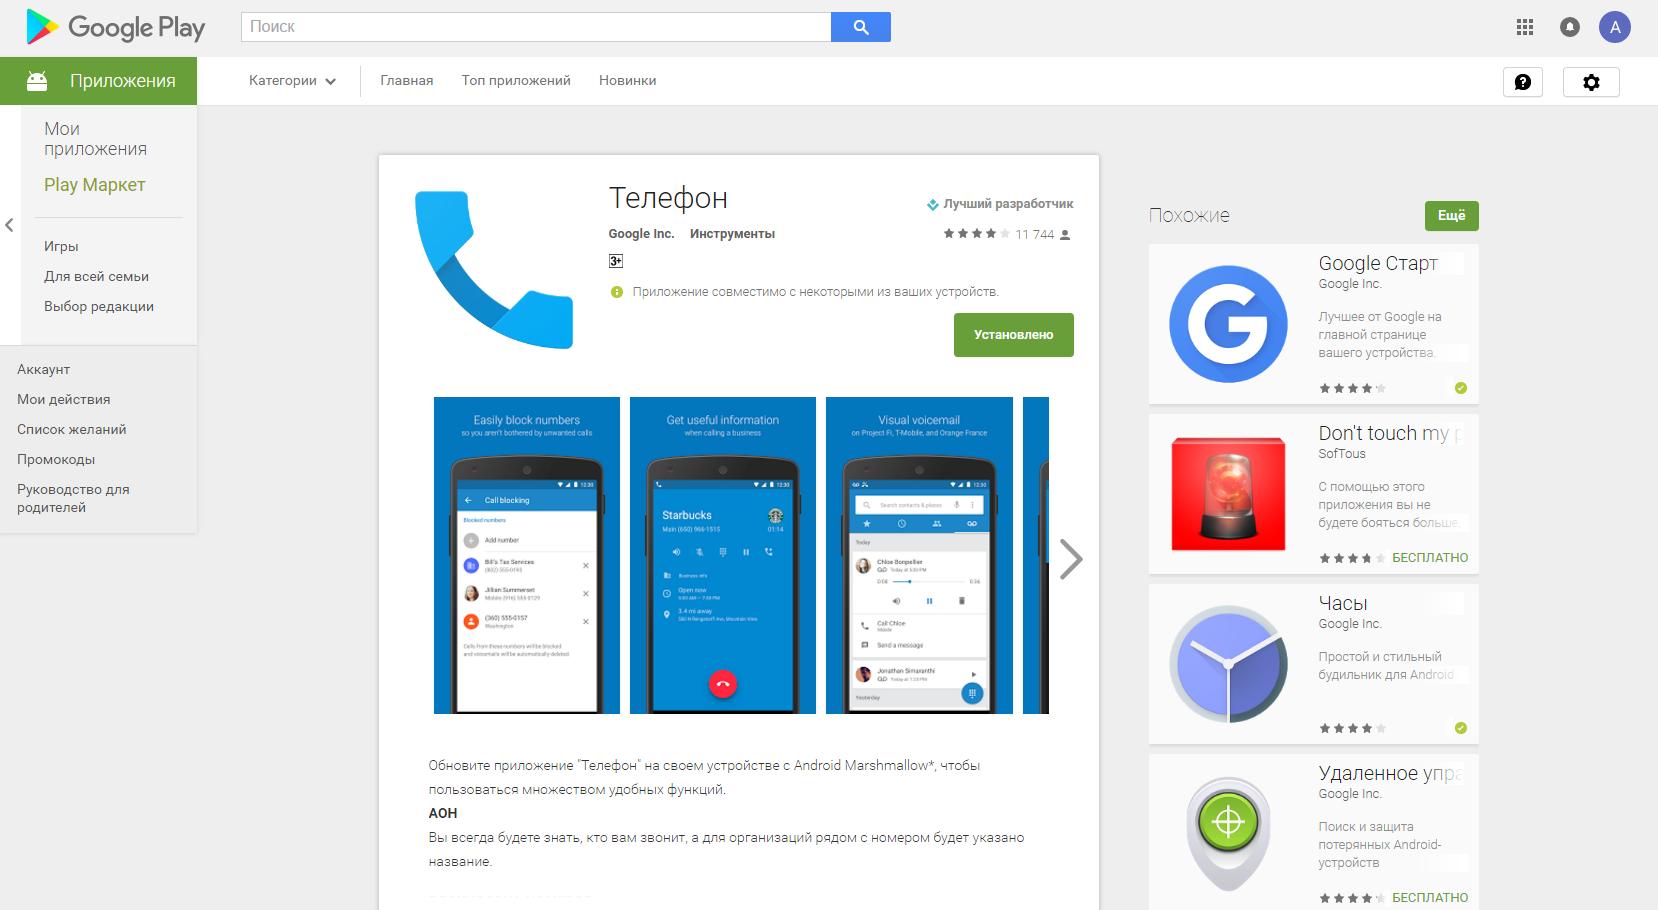 Приложение Google Phone на андроид обеспечено защитой отспама